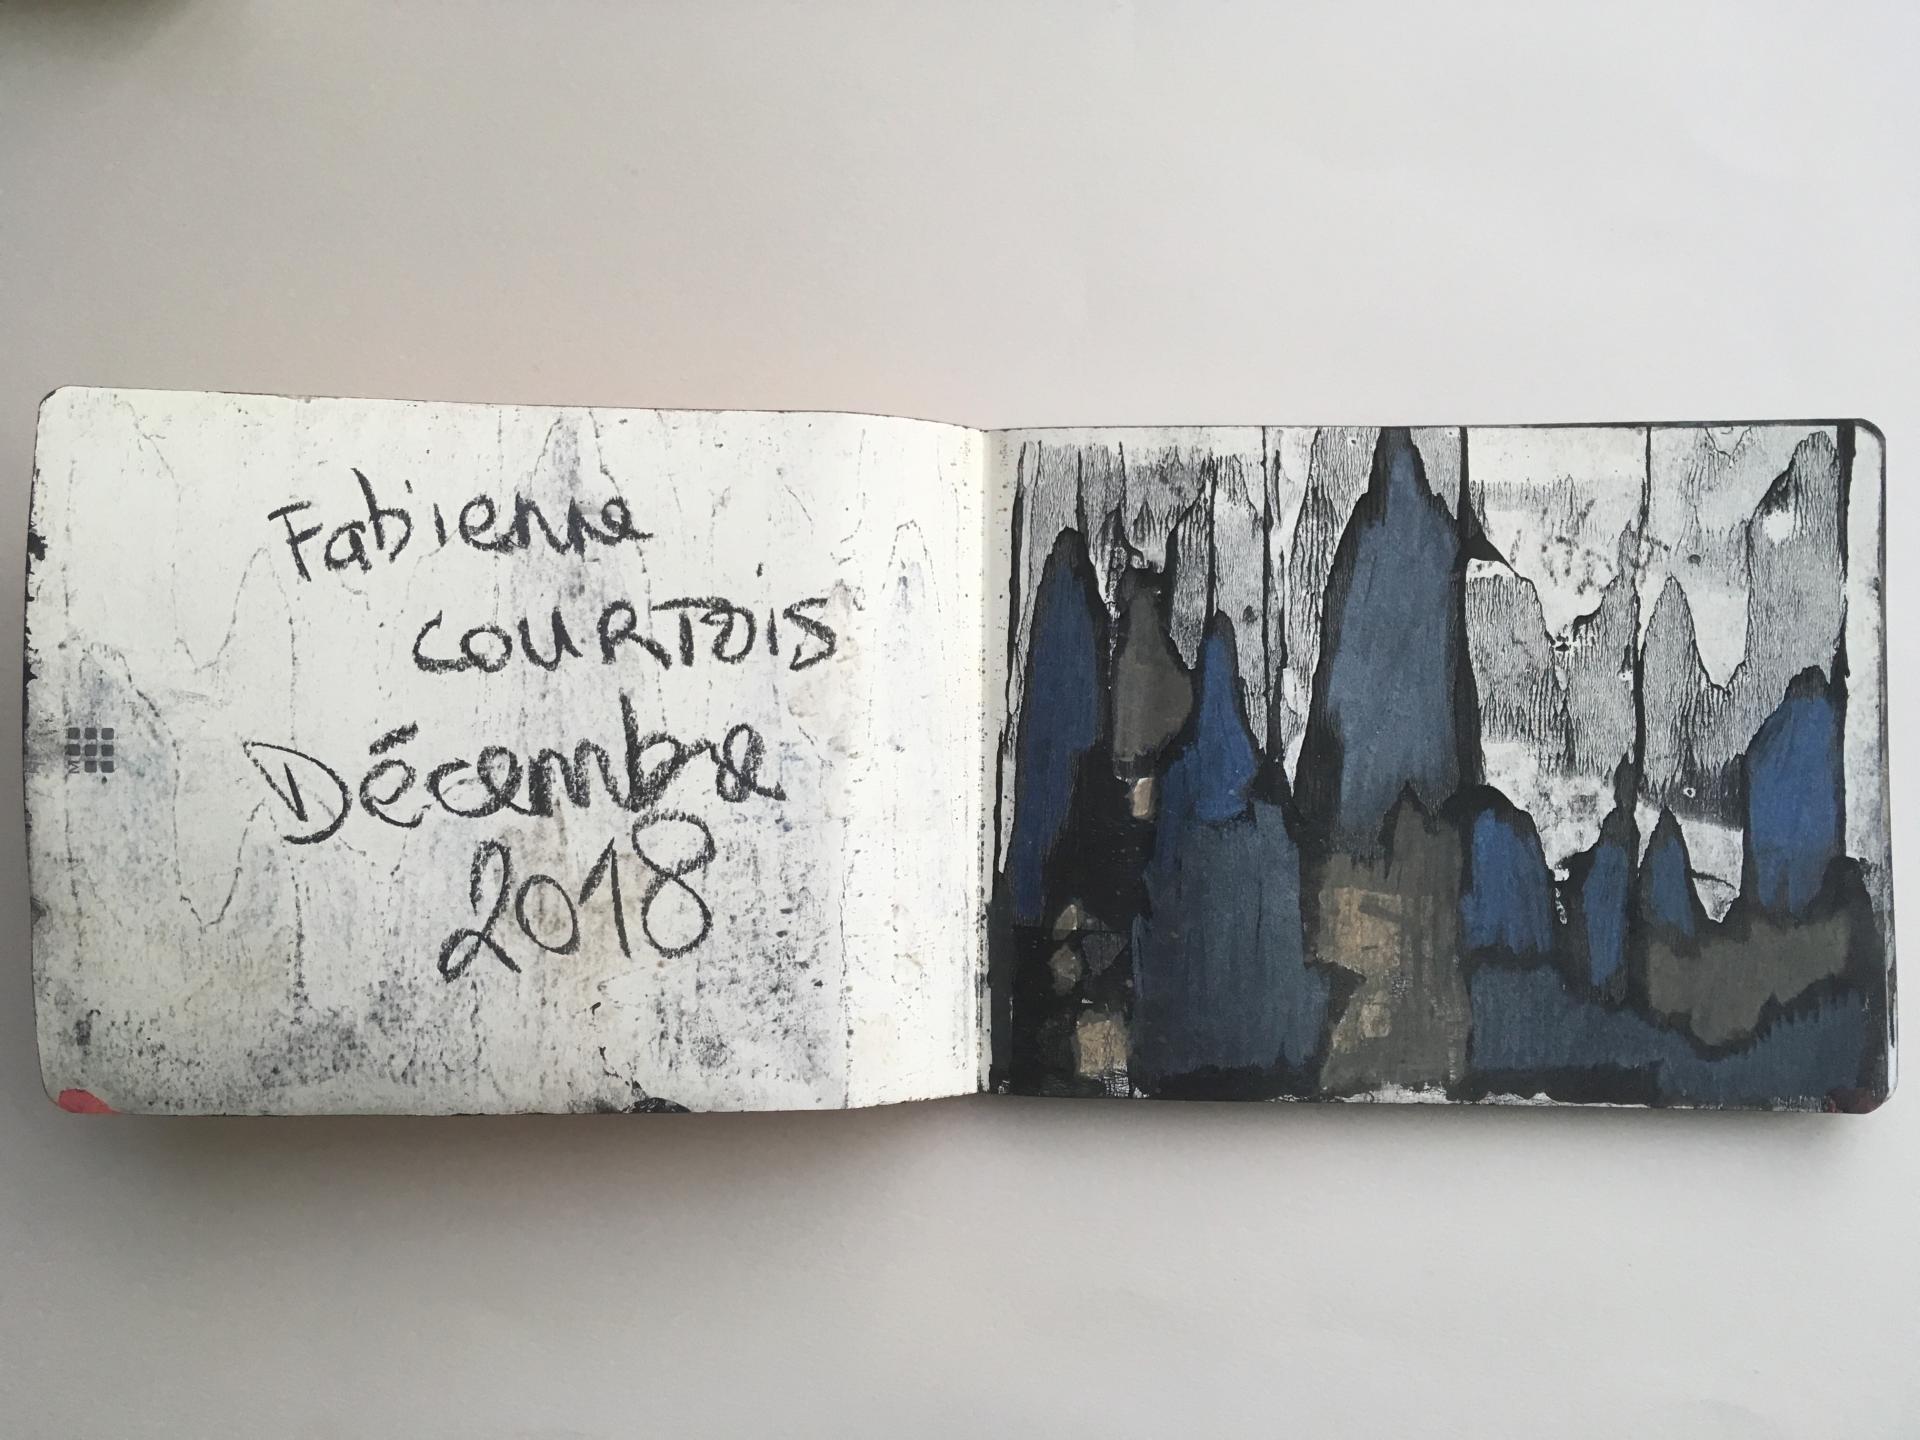 22 janv 02